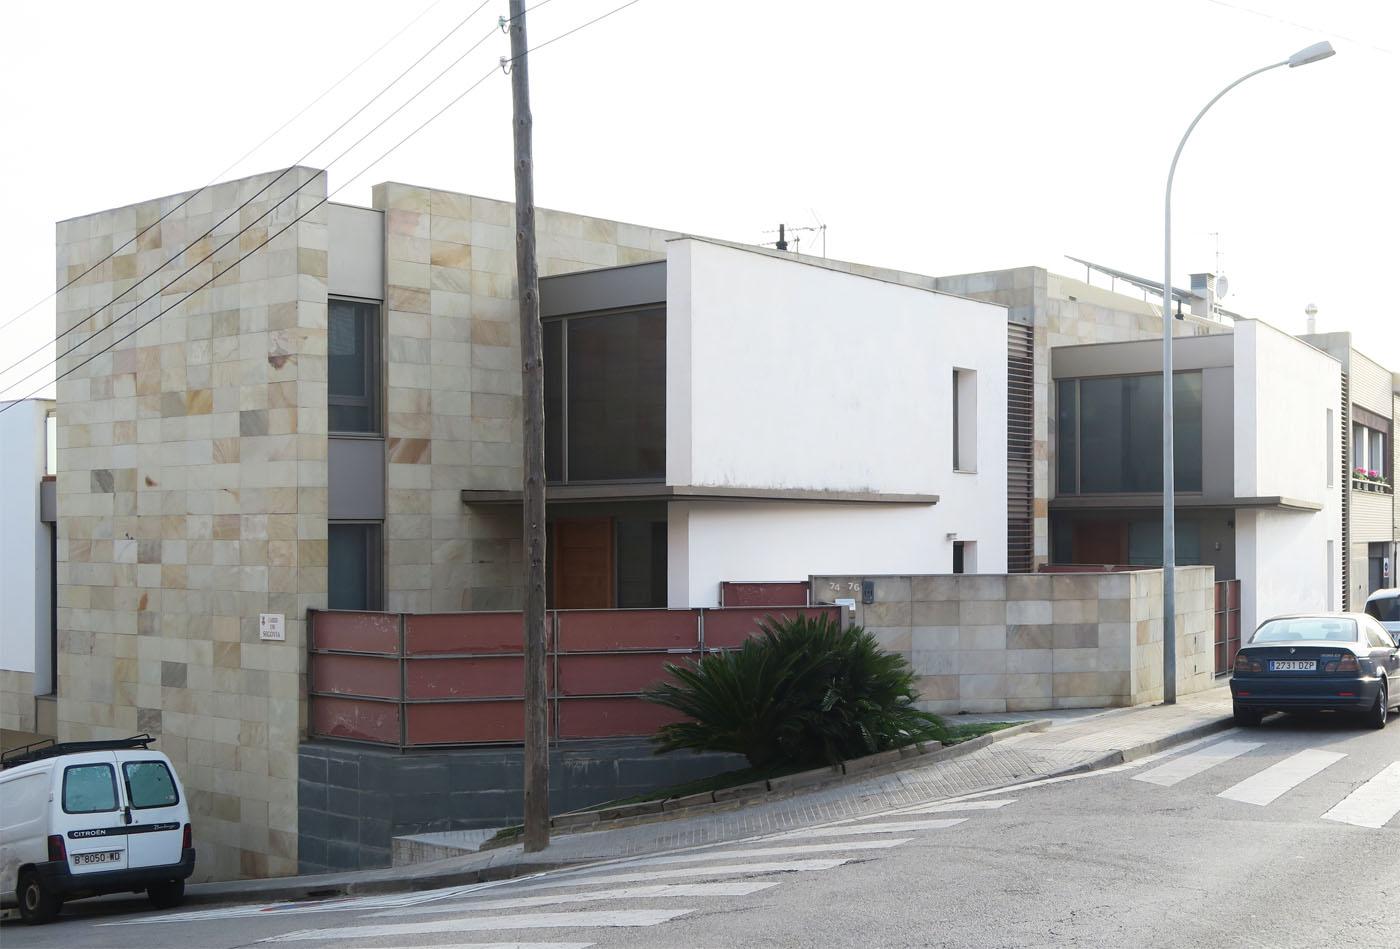 Viviendas adosadas en Rubi_Gloria Duran Arquitecto